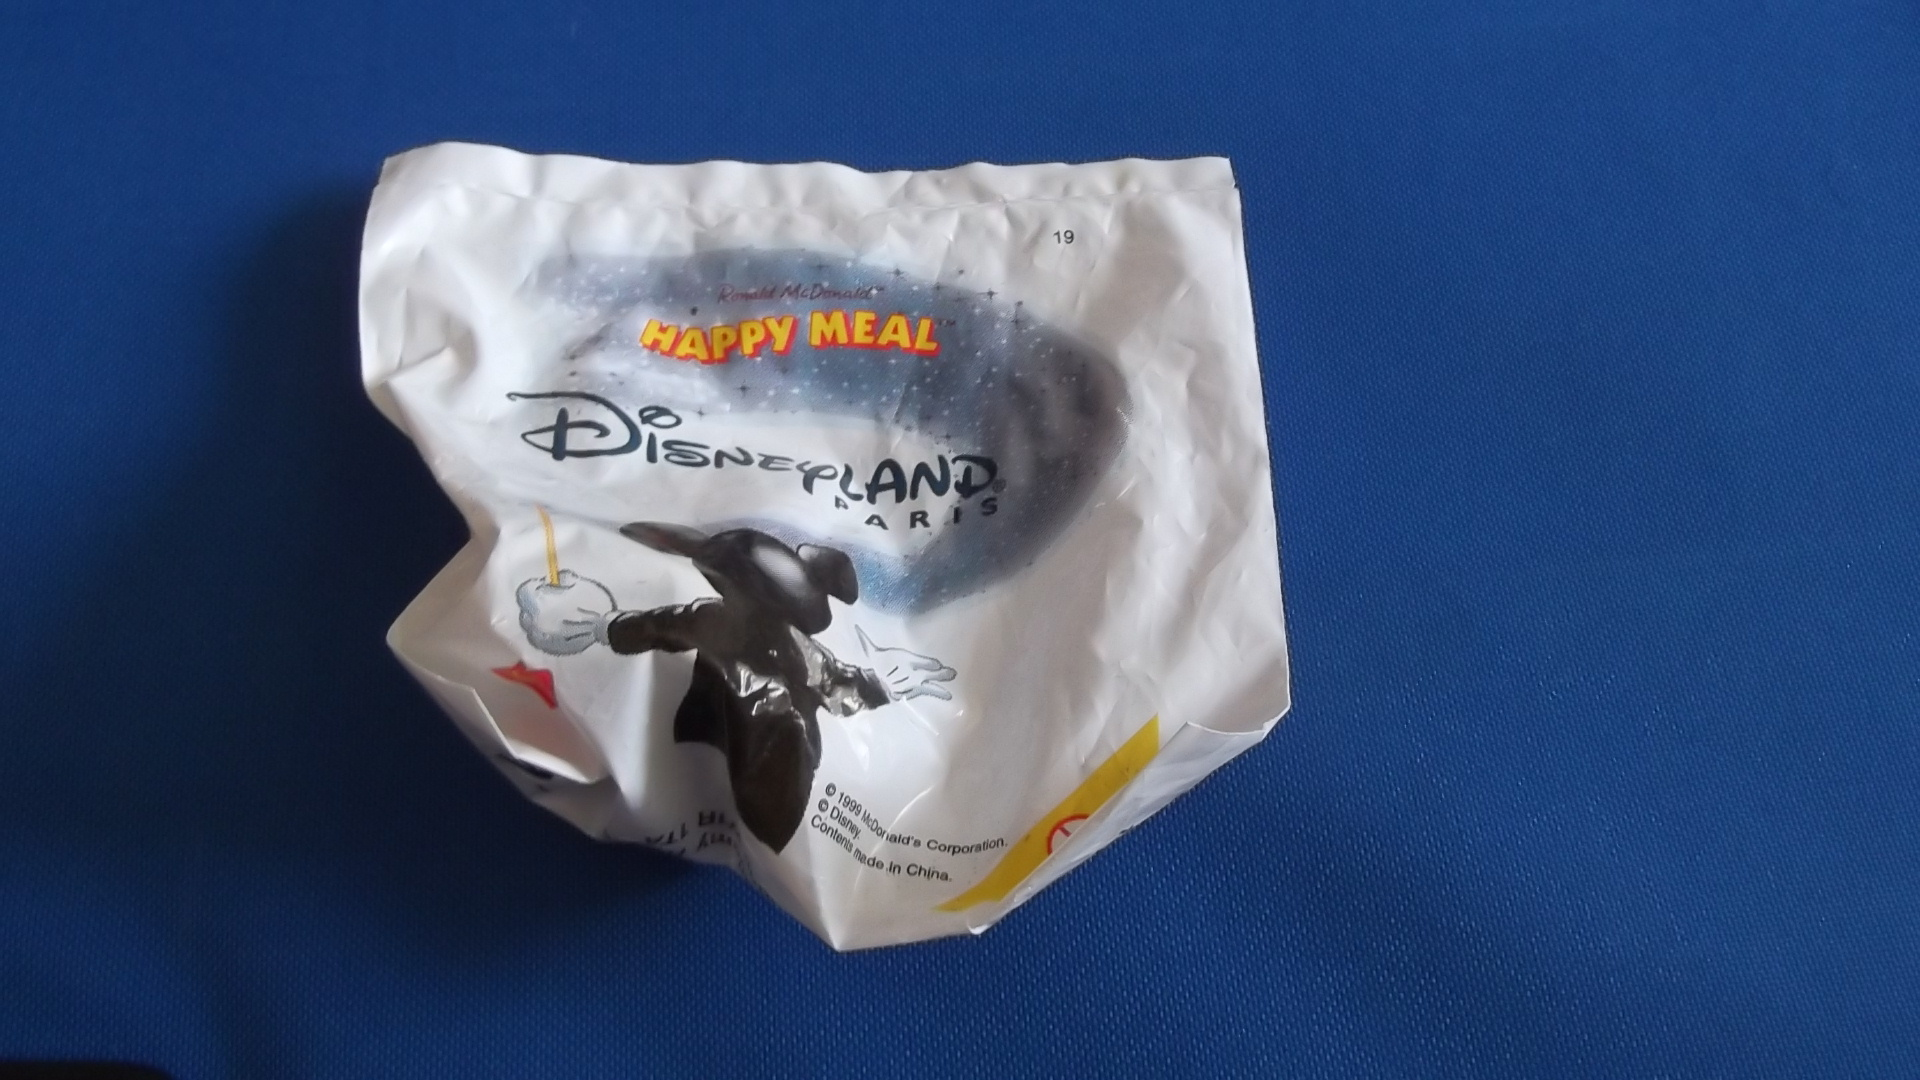 McDonalds Disneyland Paris Train #19 Toy From 1999 New